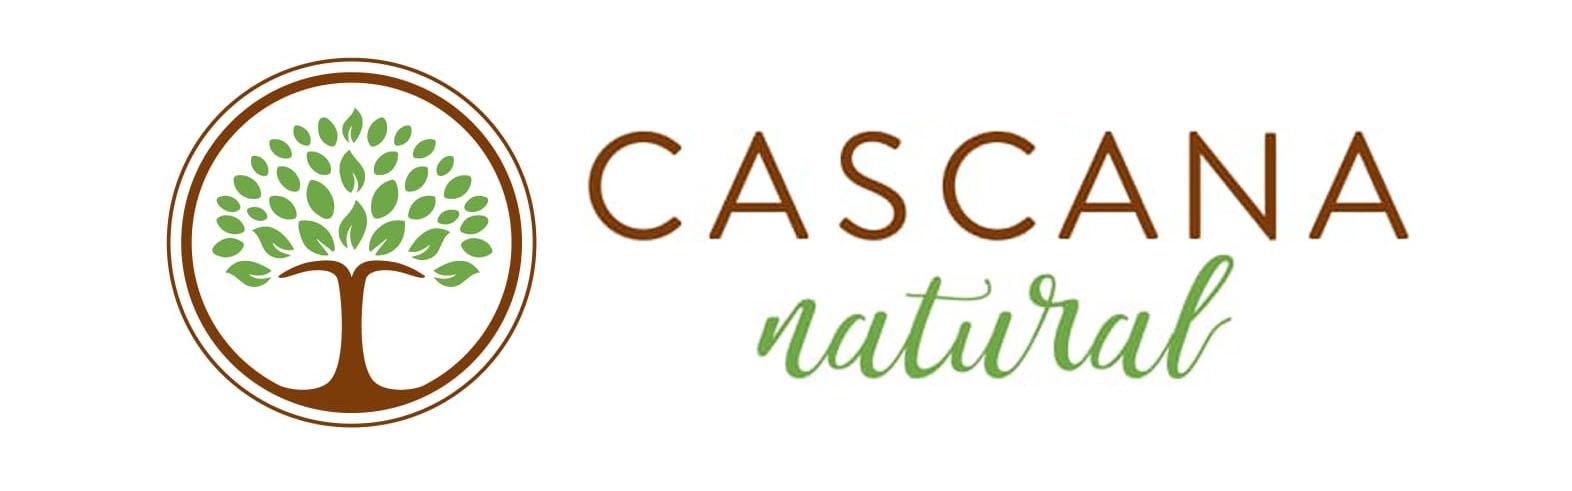 Cascana Natural